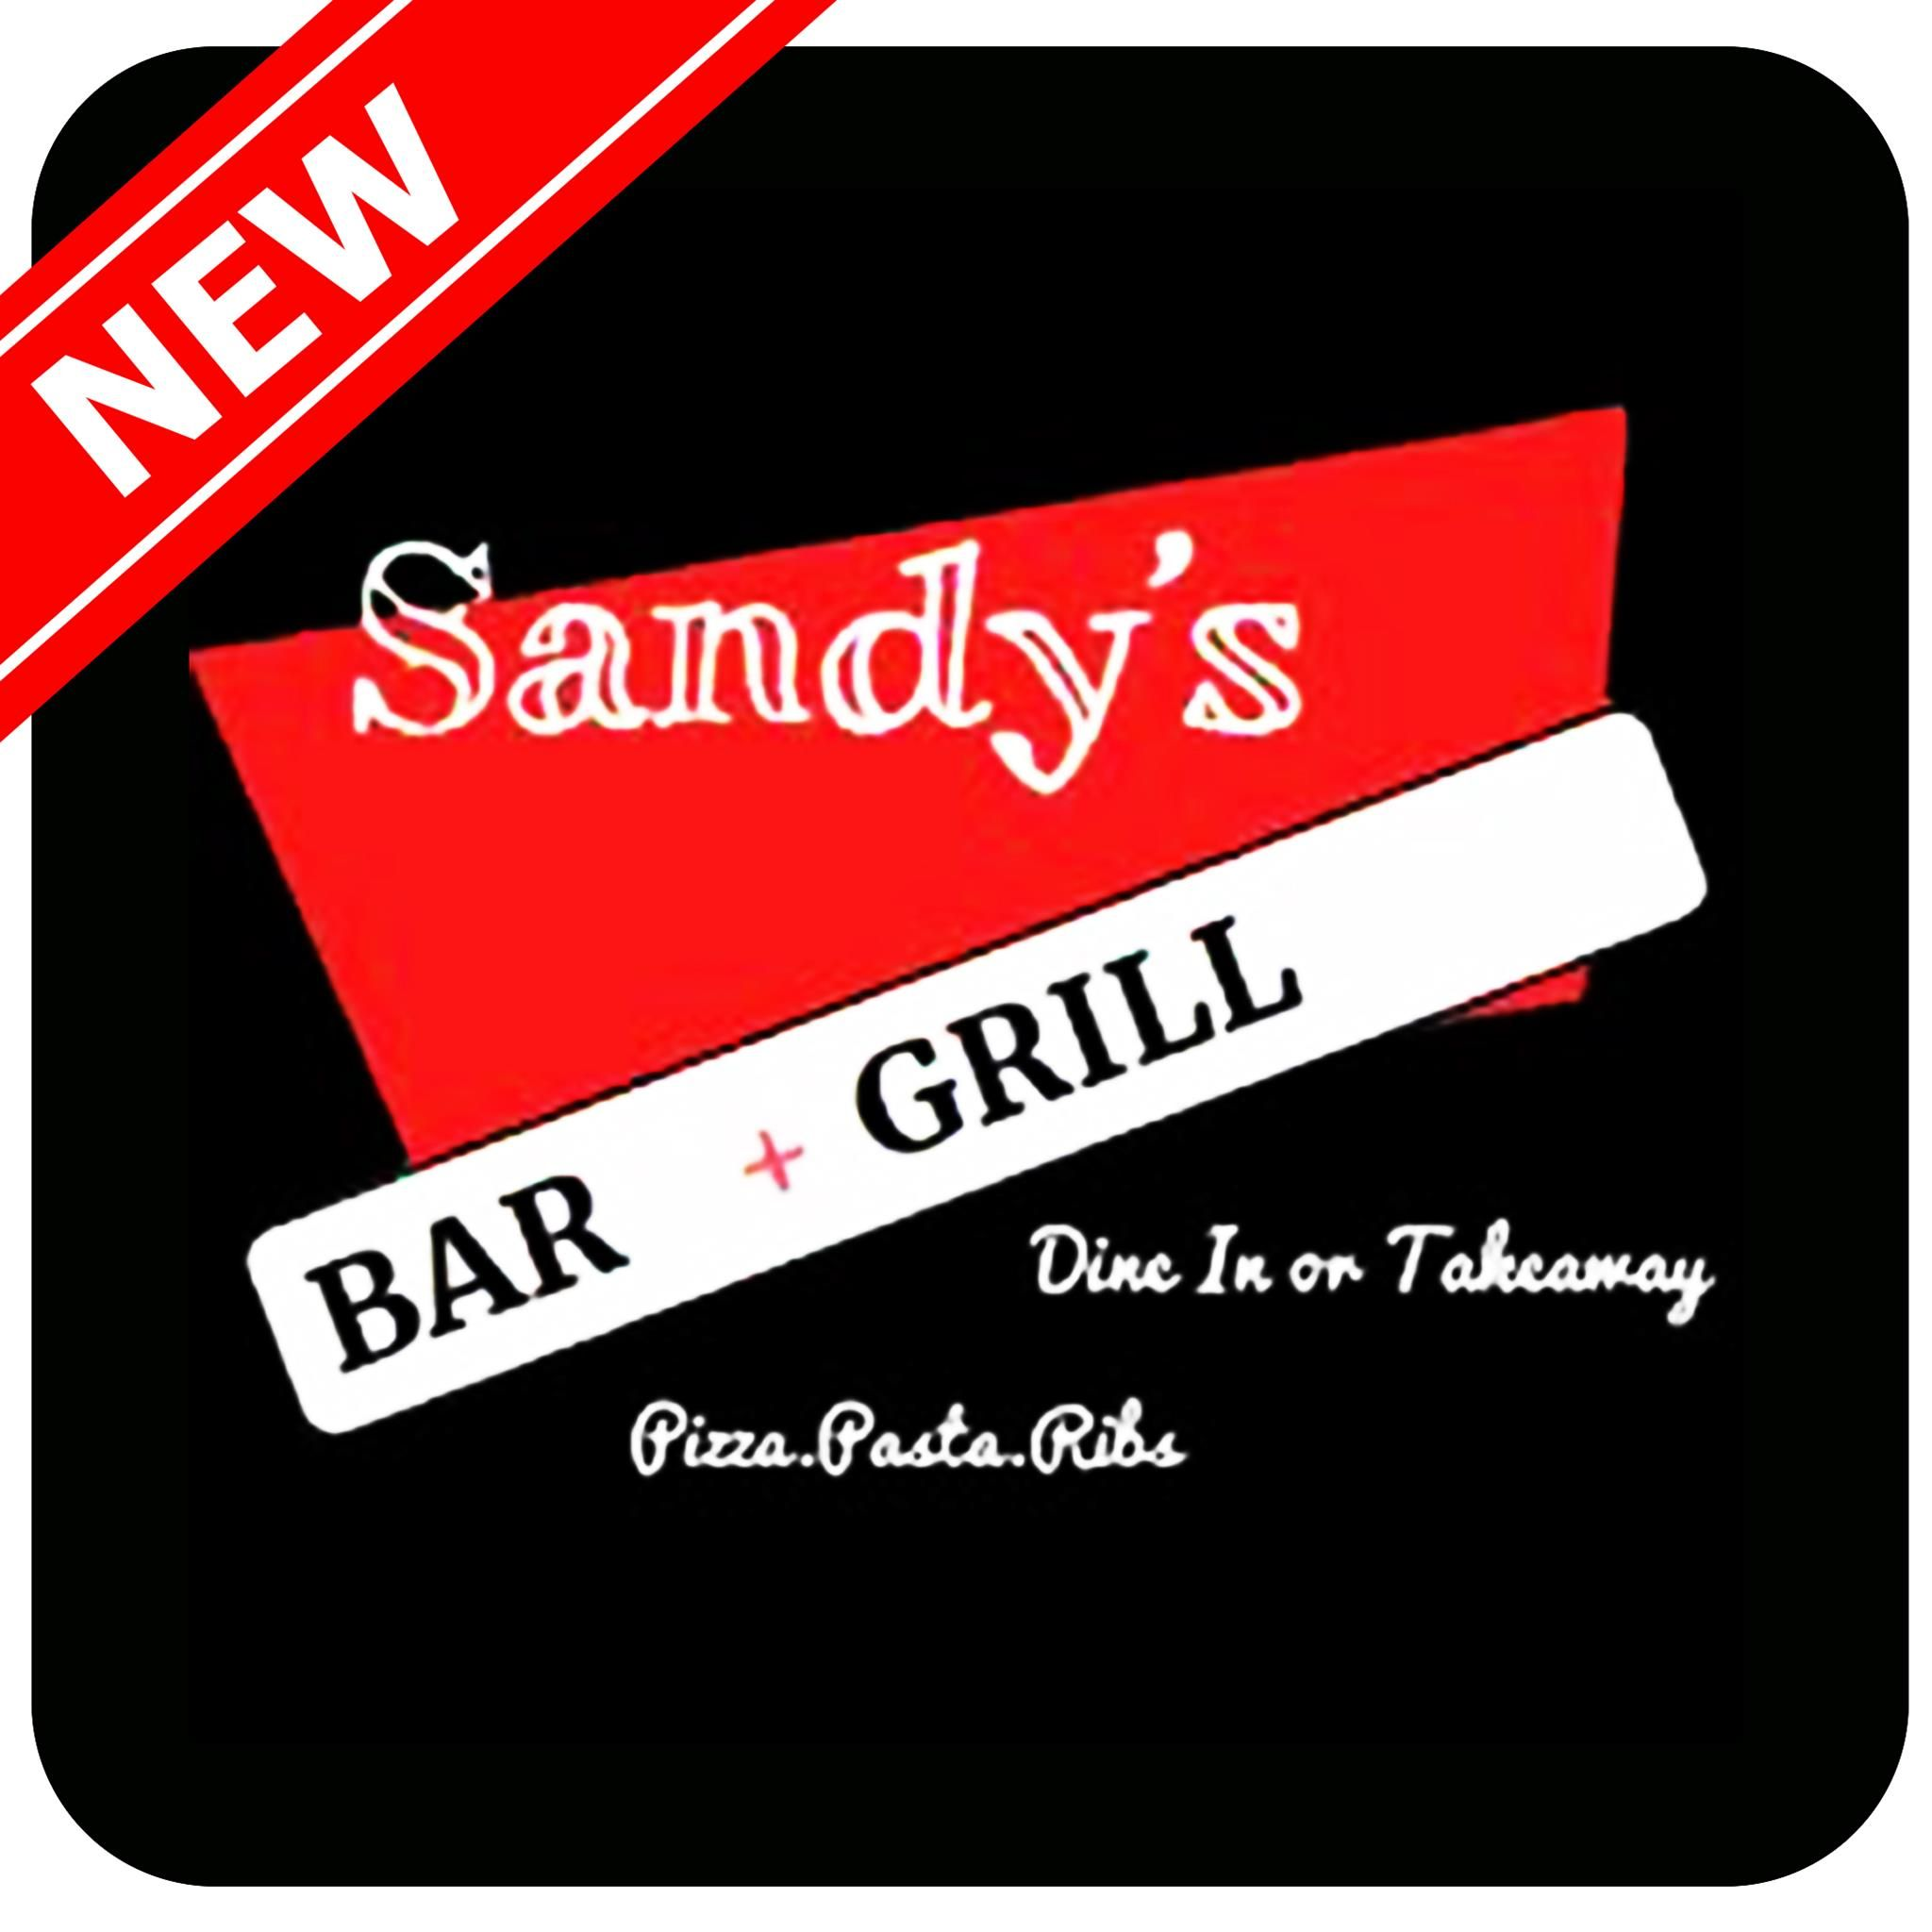 Sandy's Bar + Grill